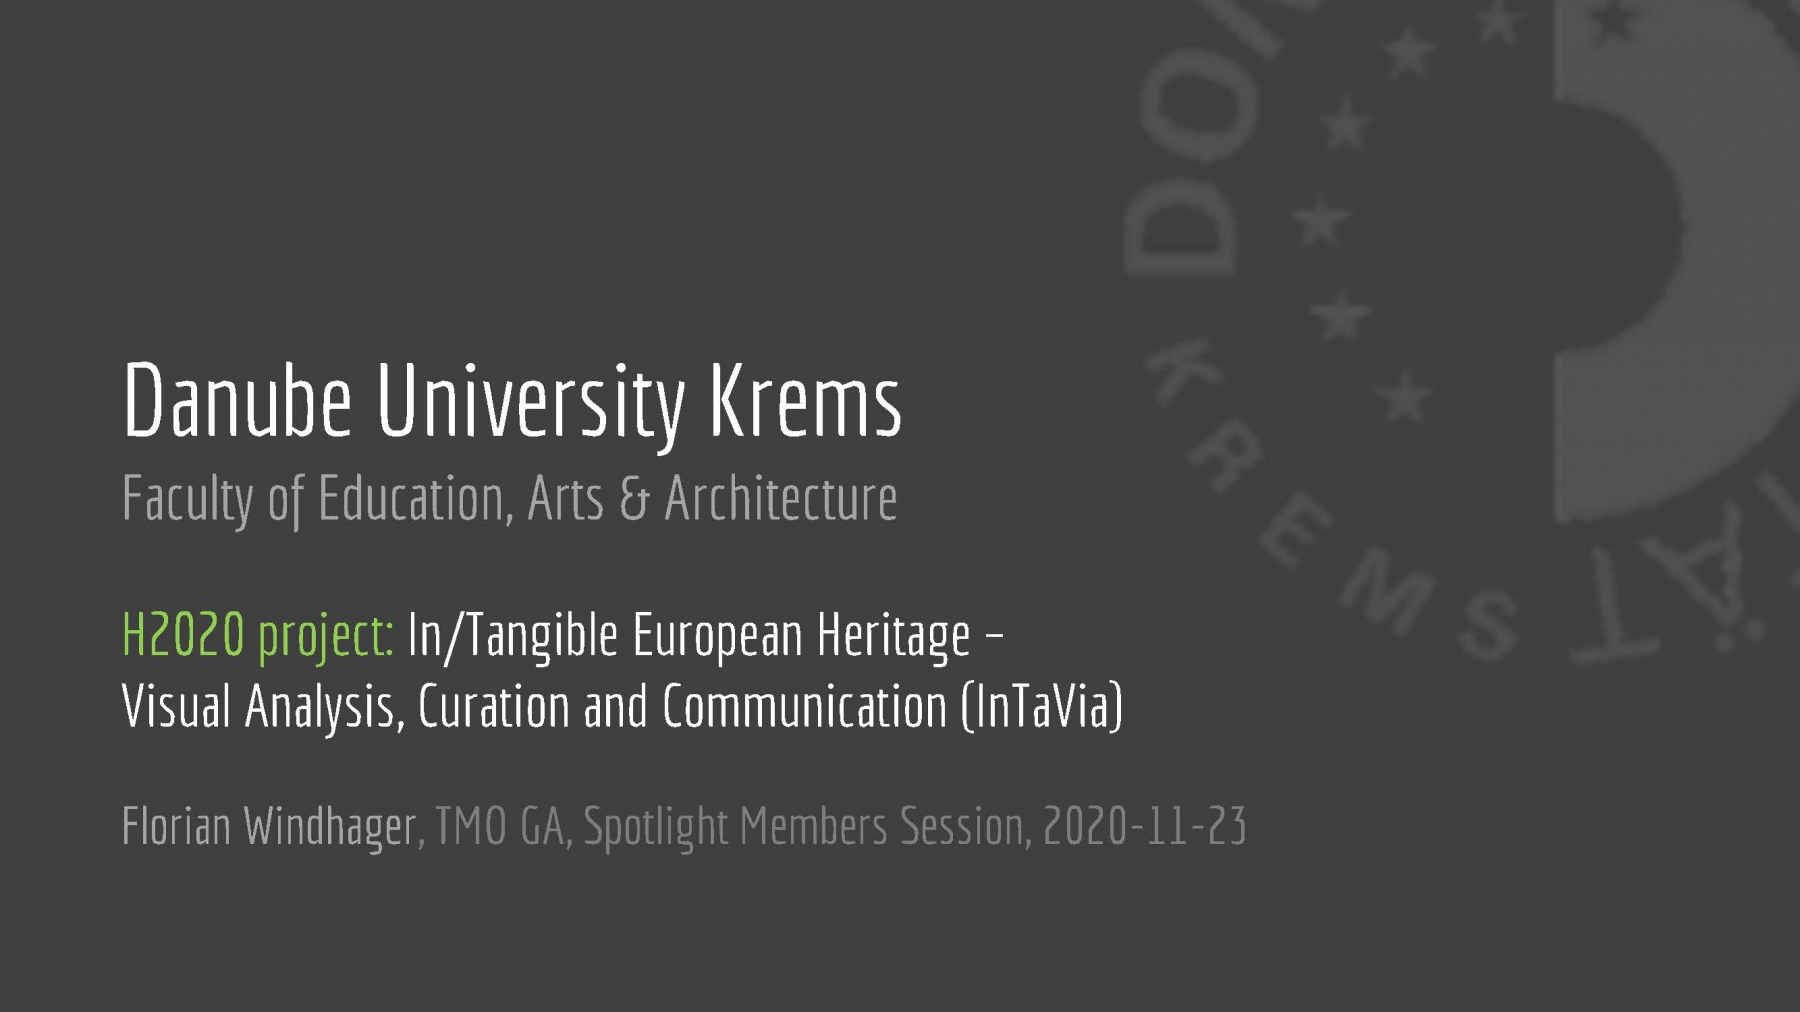 Danube University Krems  (pres. by Florian Windhager)